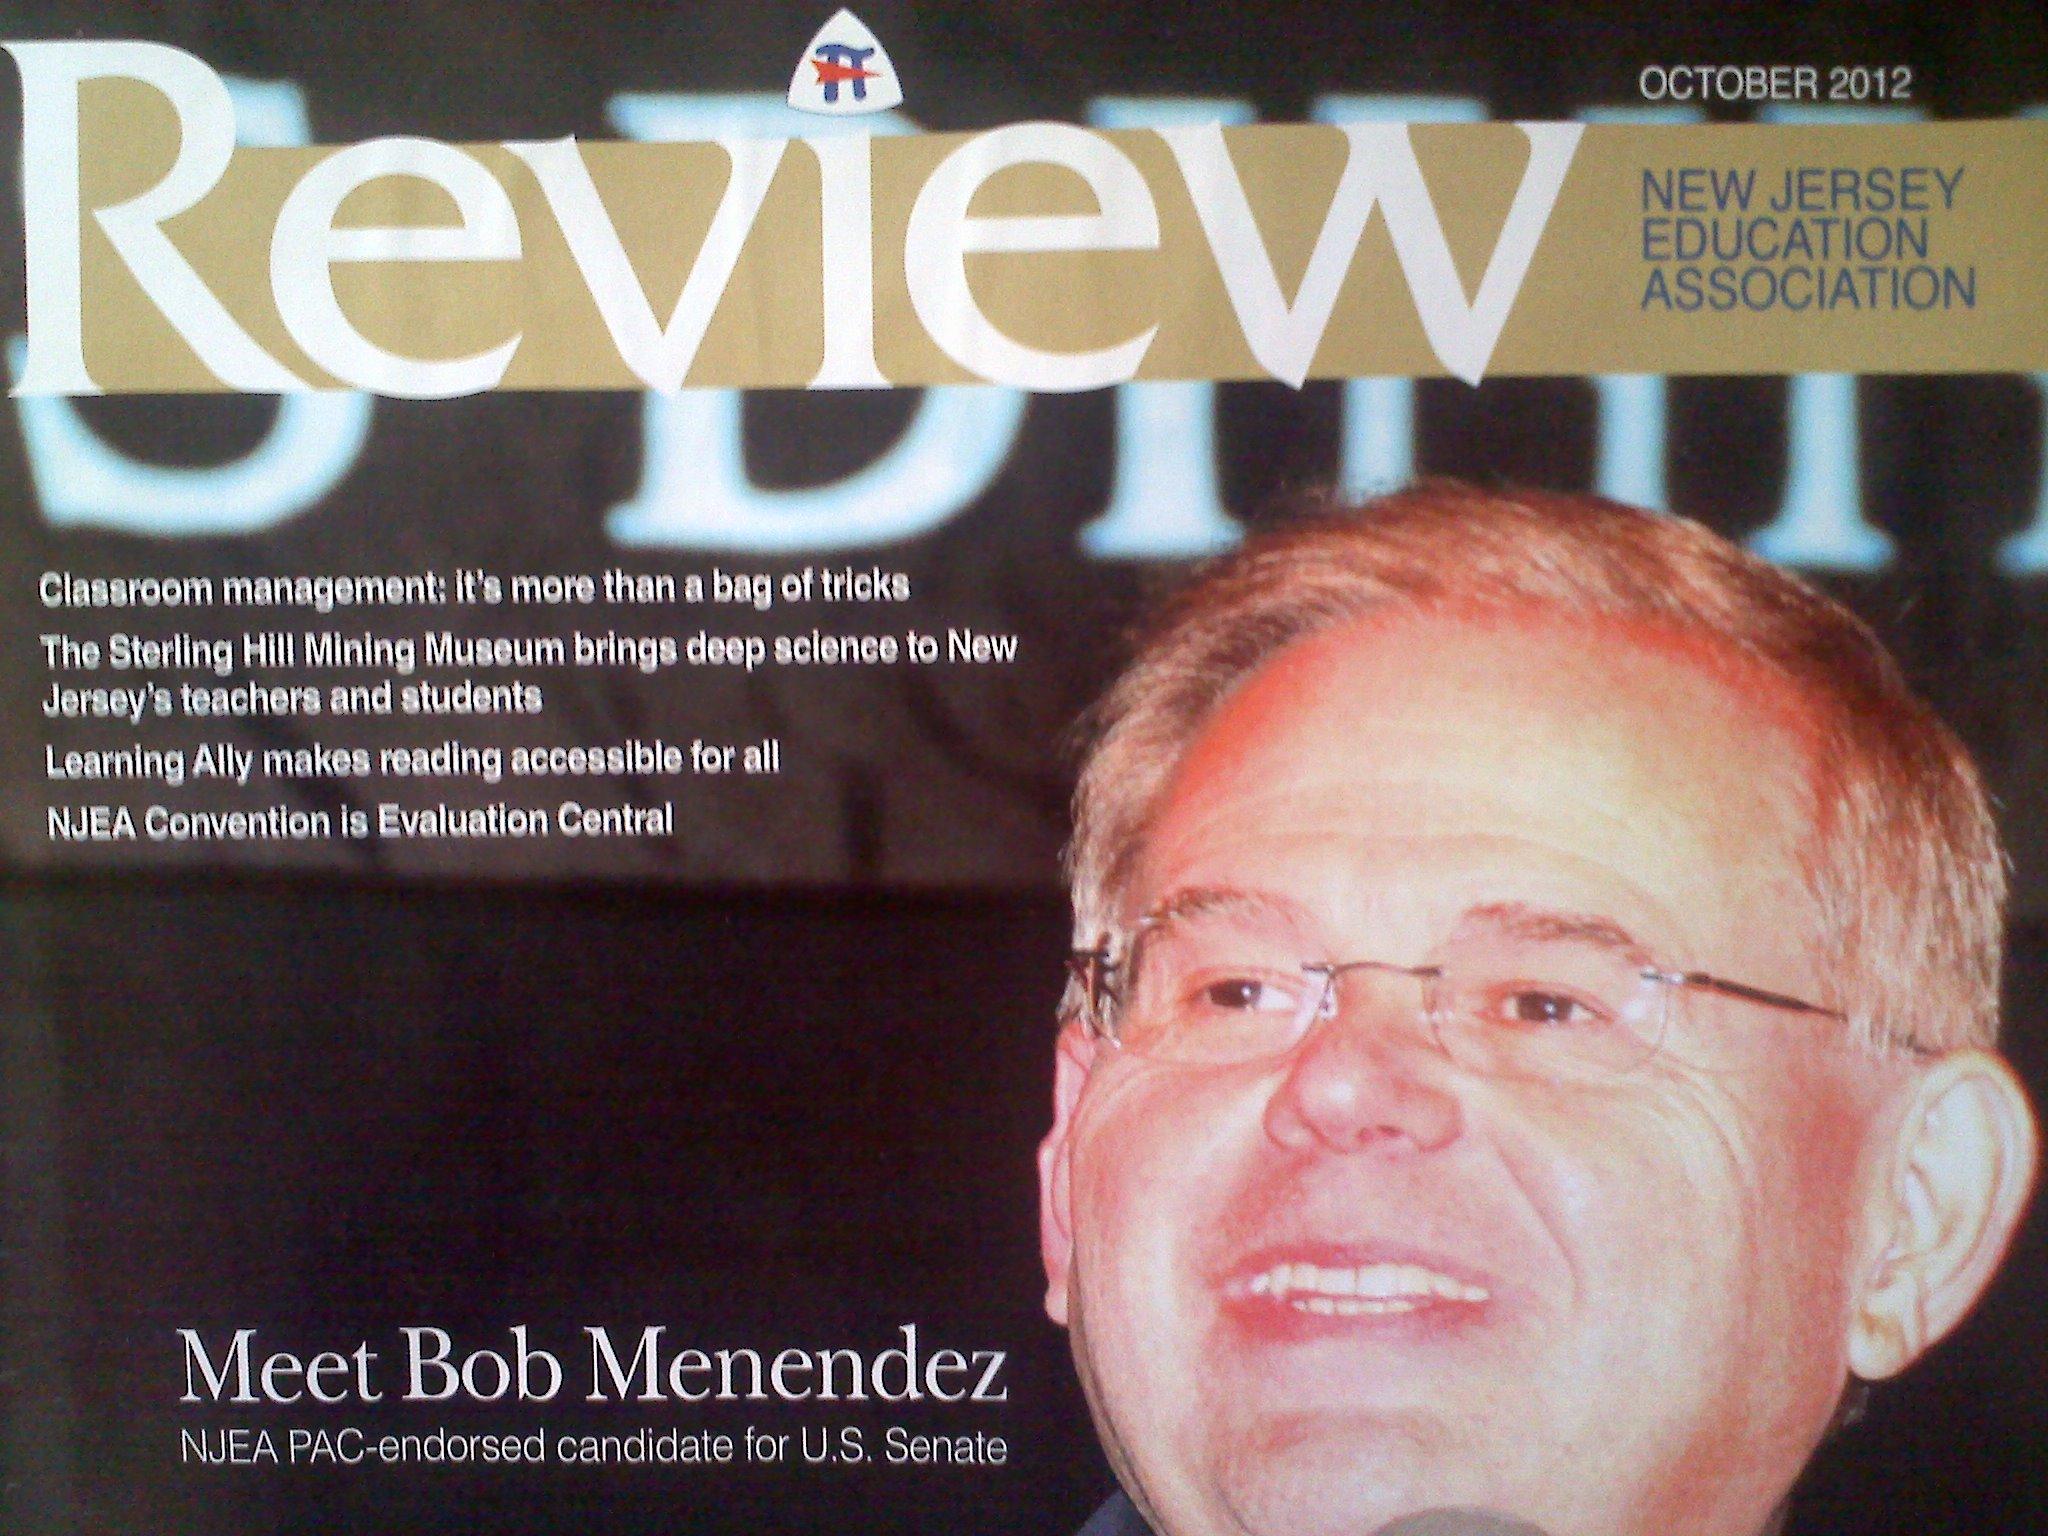 Bob Menendez